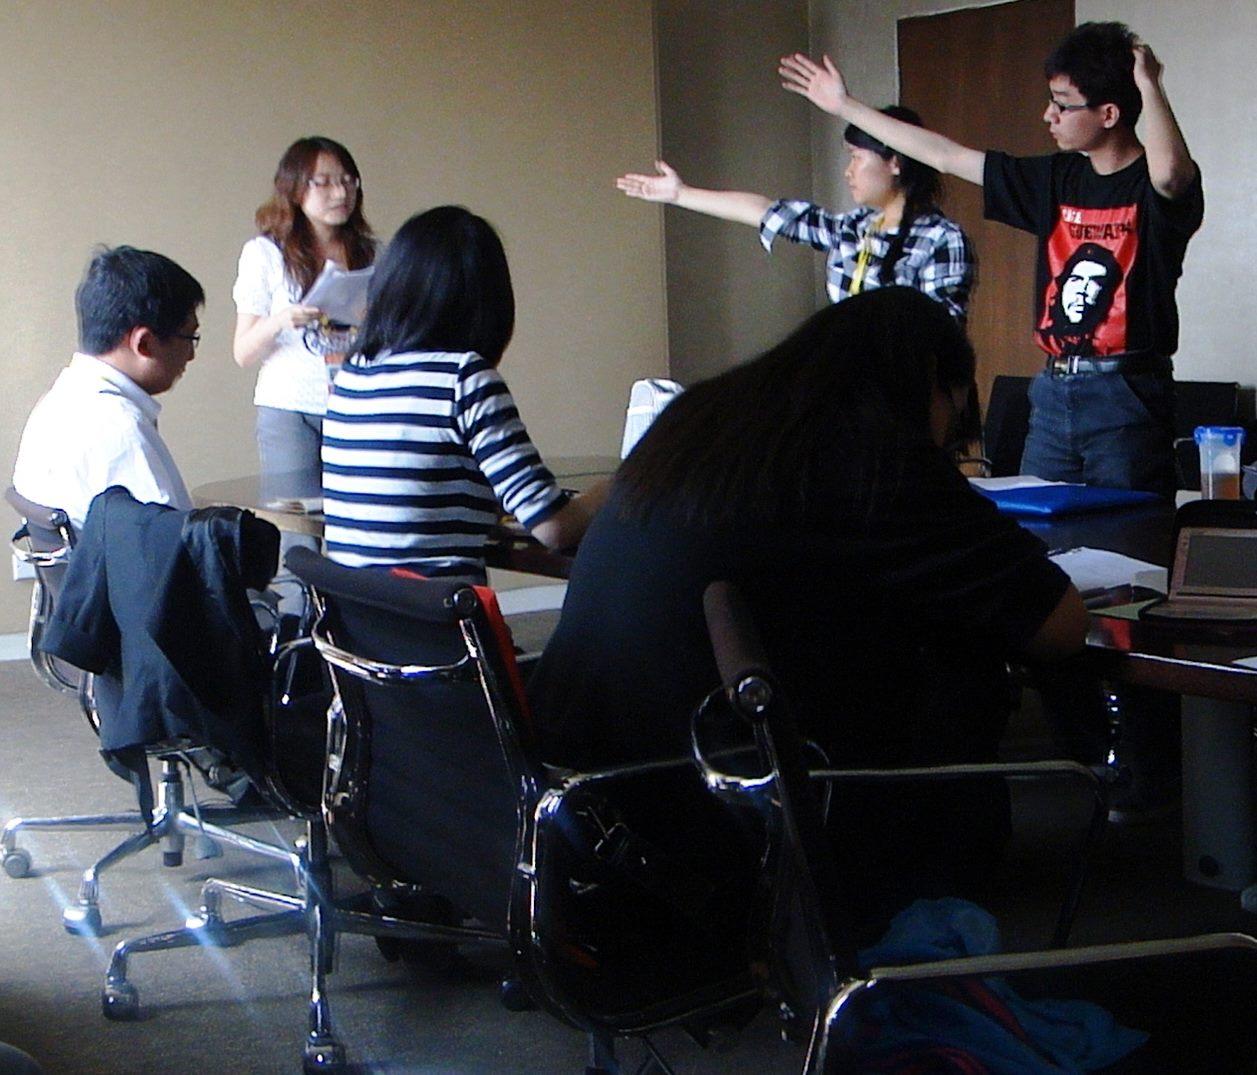 Language learning through public speaking